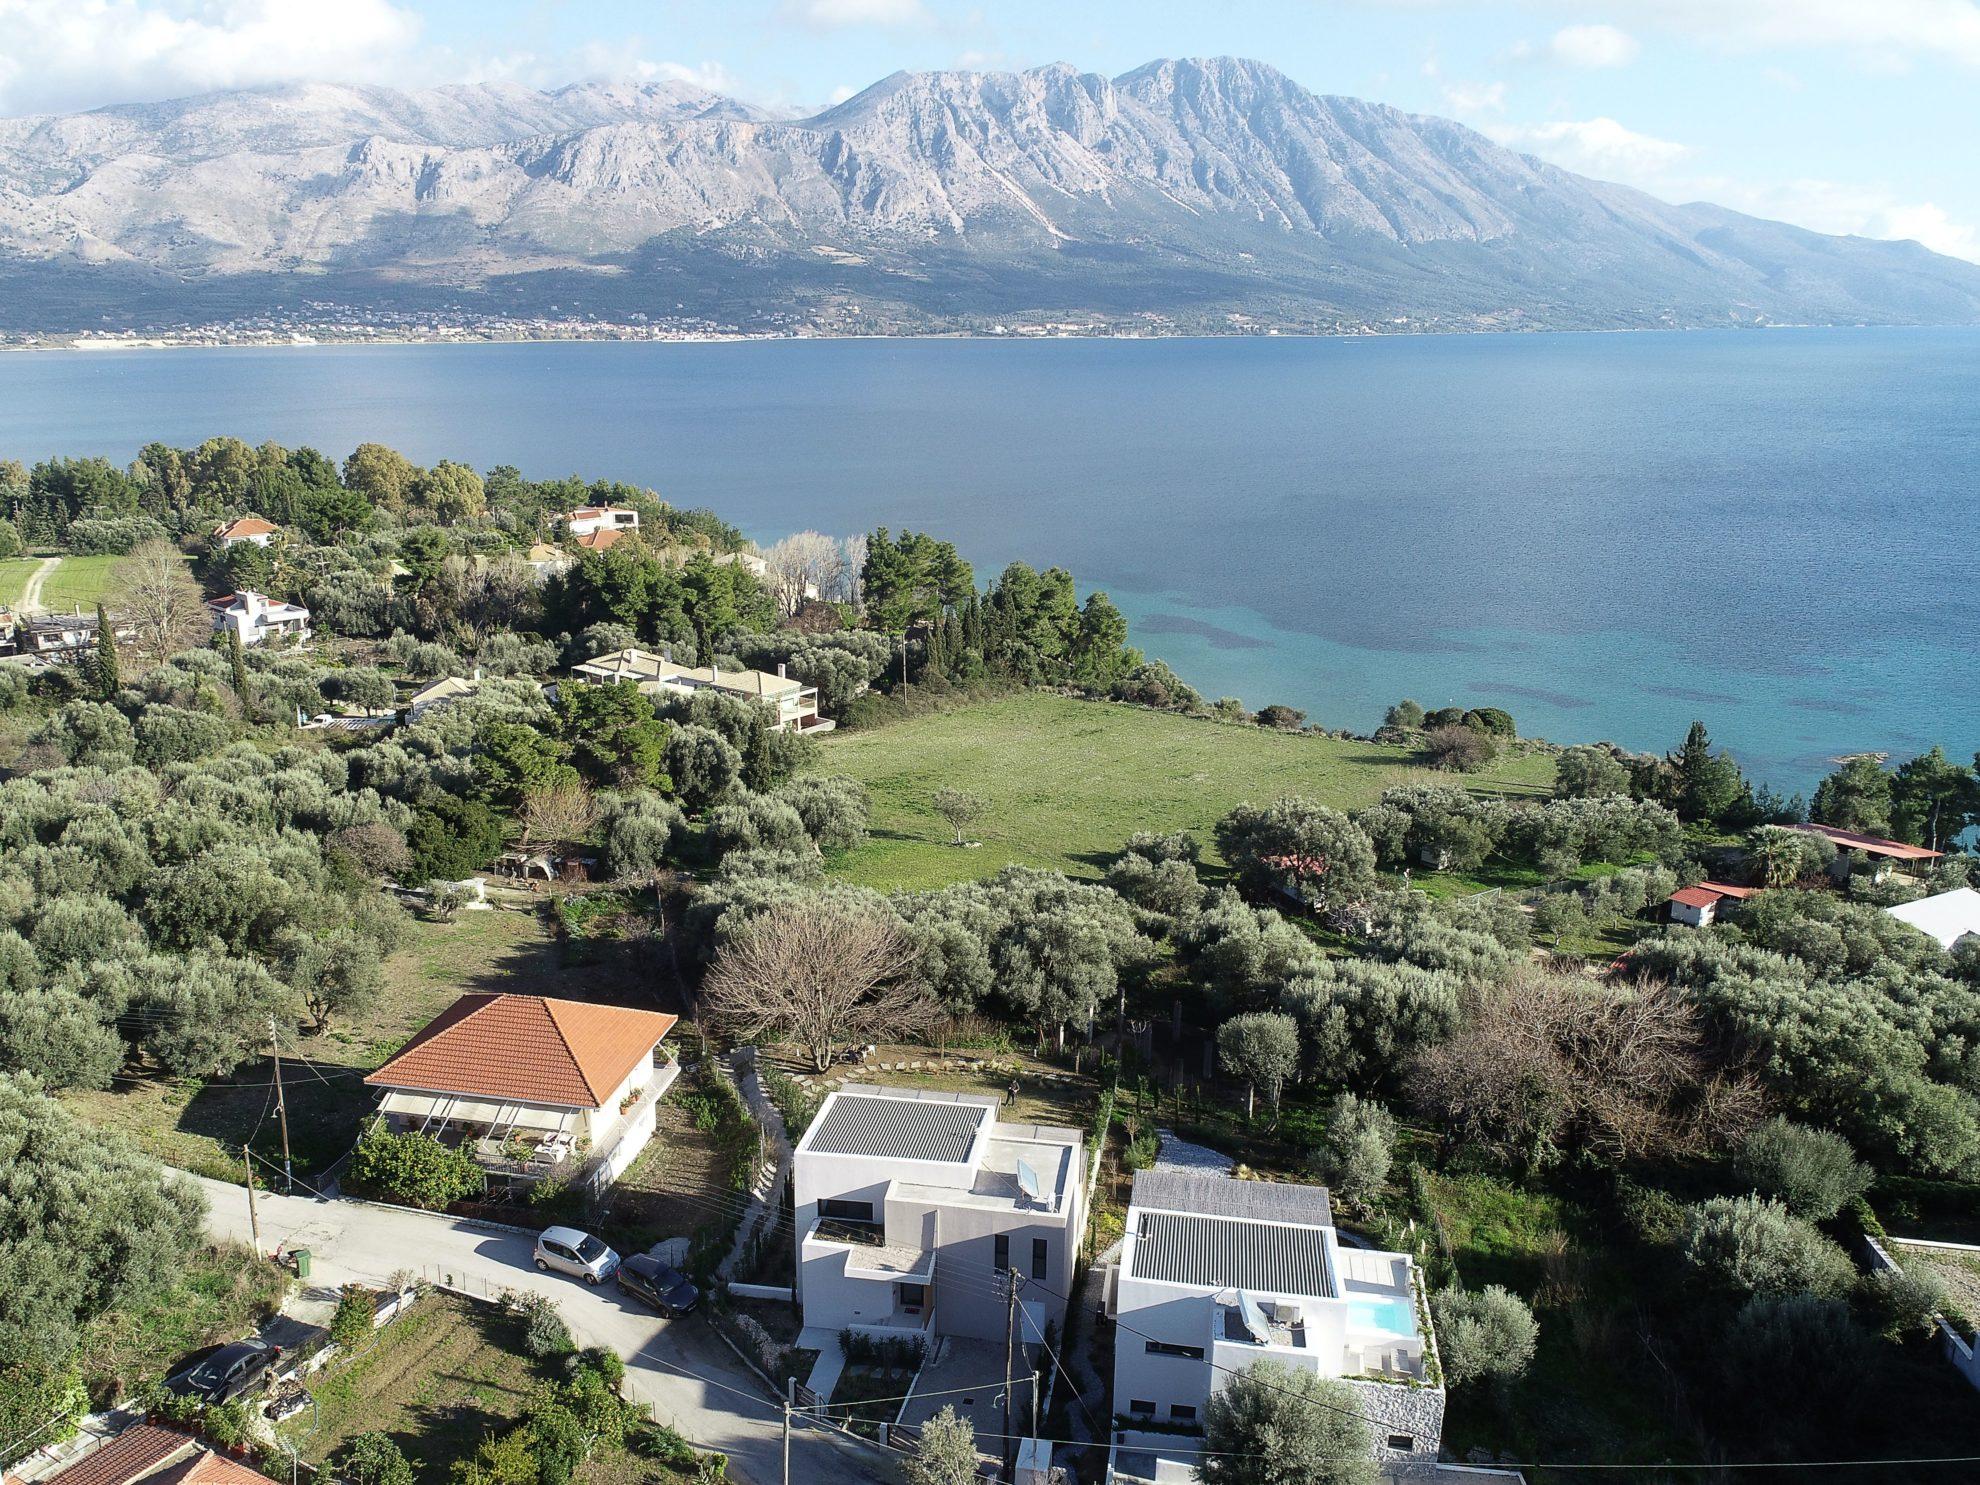 Cycling and bike rentals options at Villa Mytikas, in Paleros Greece